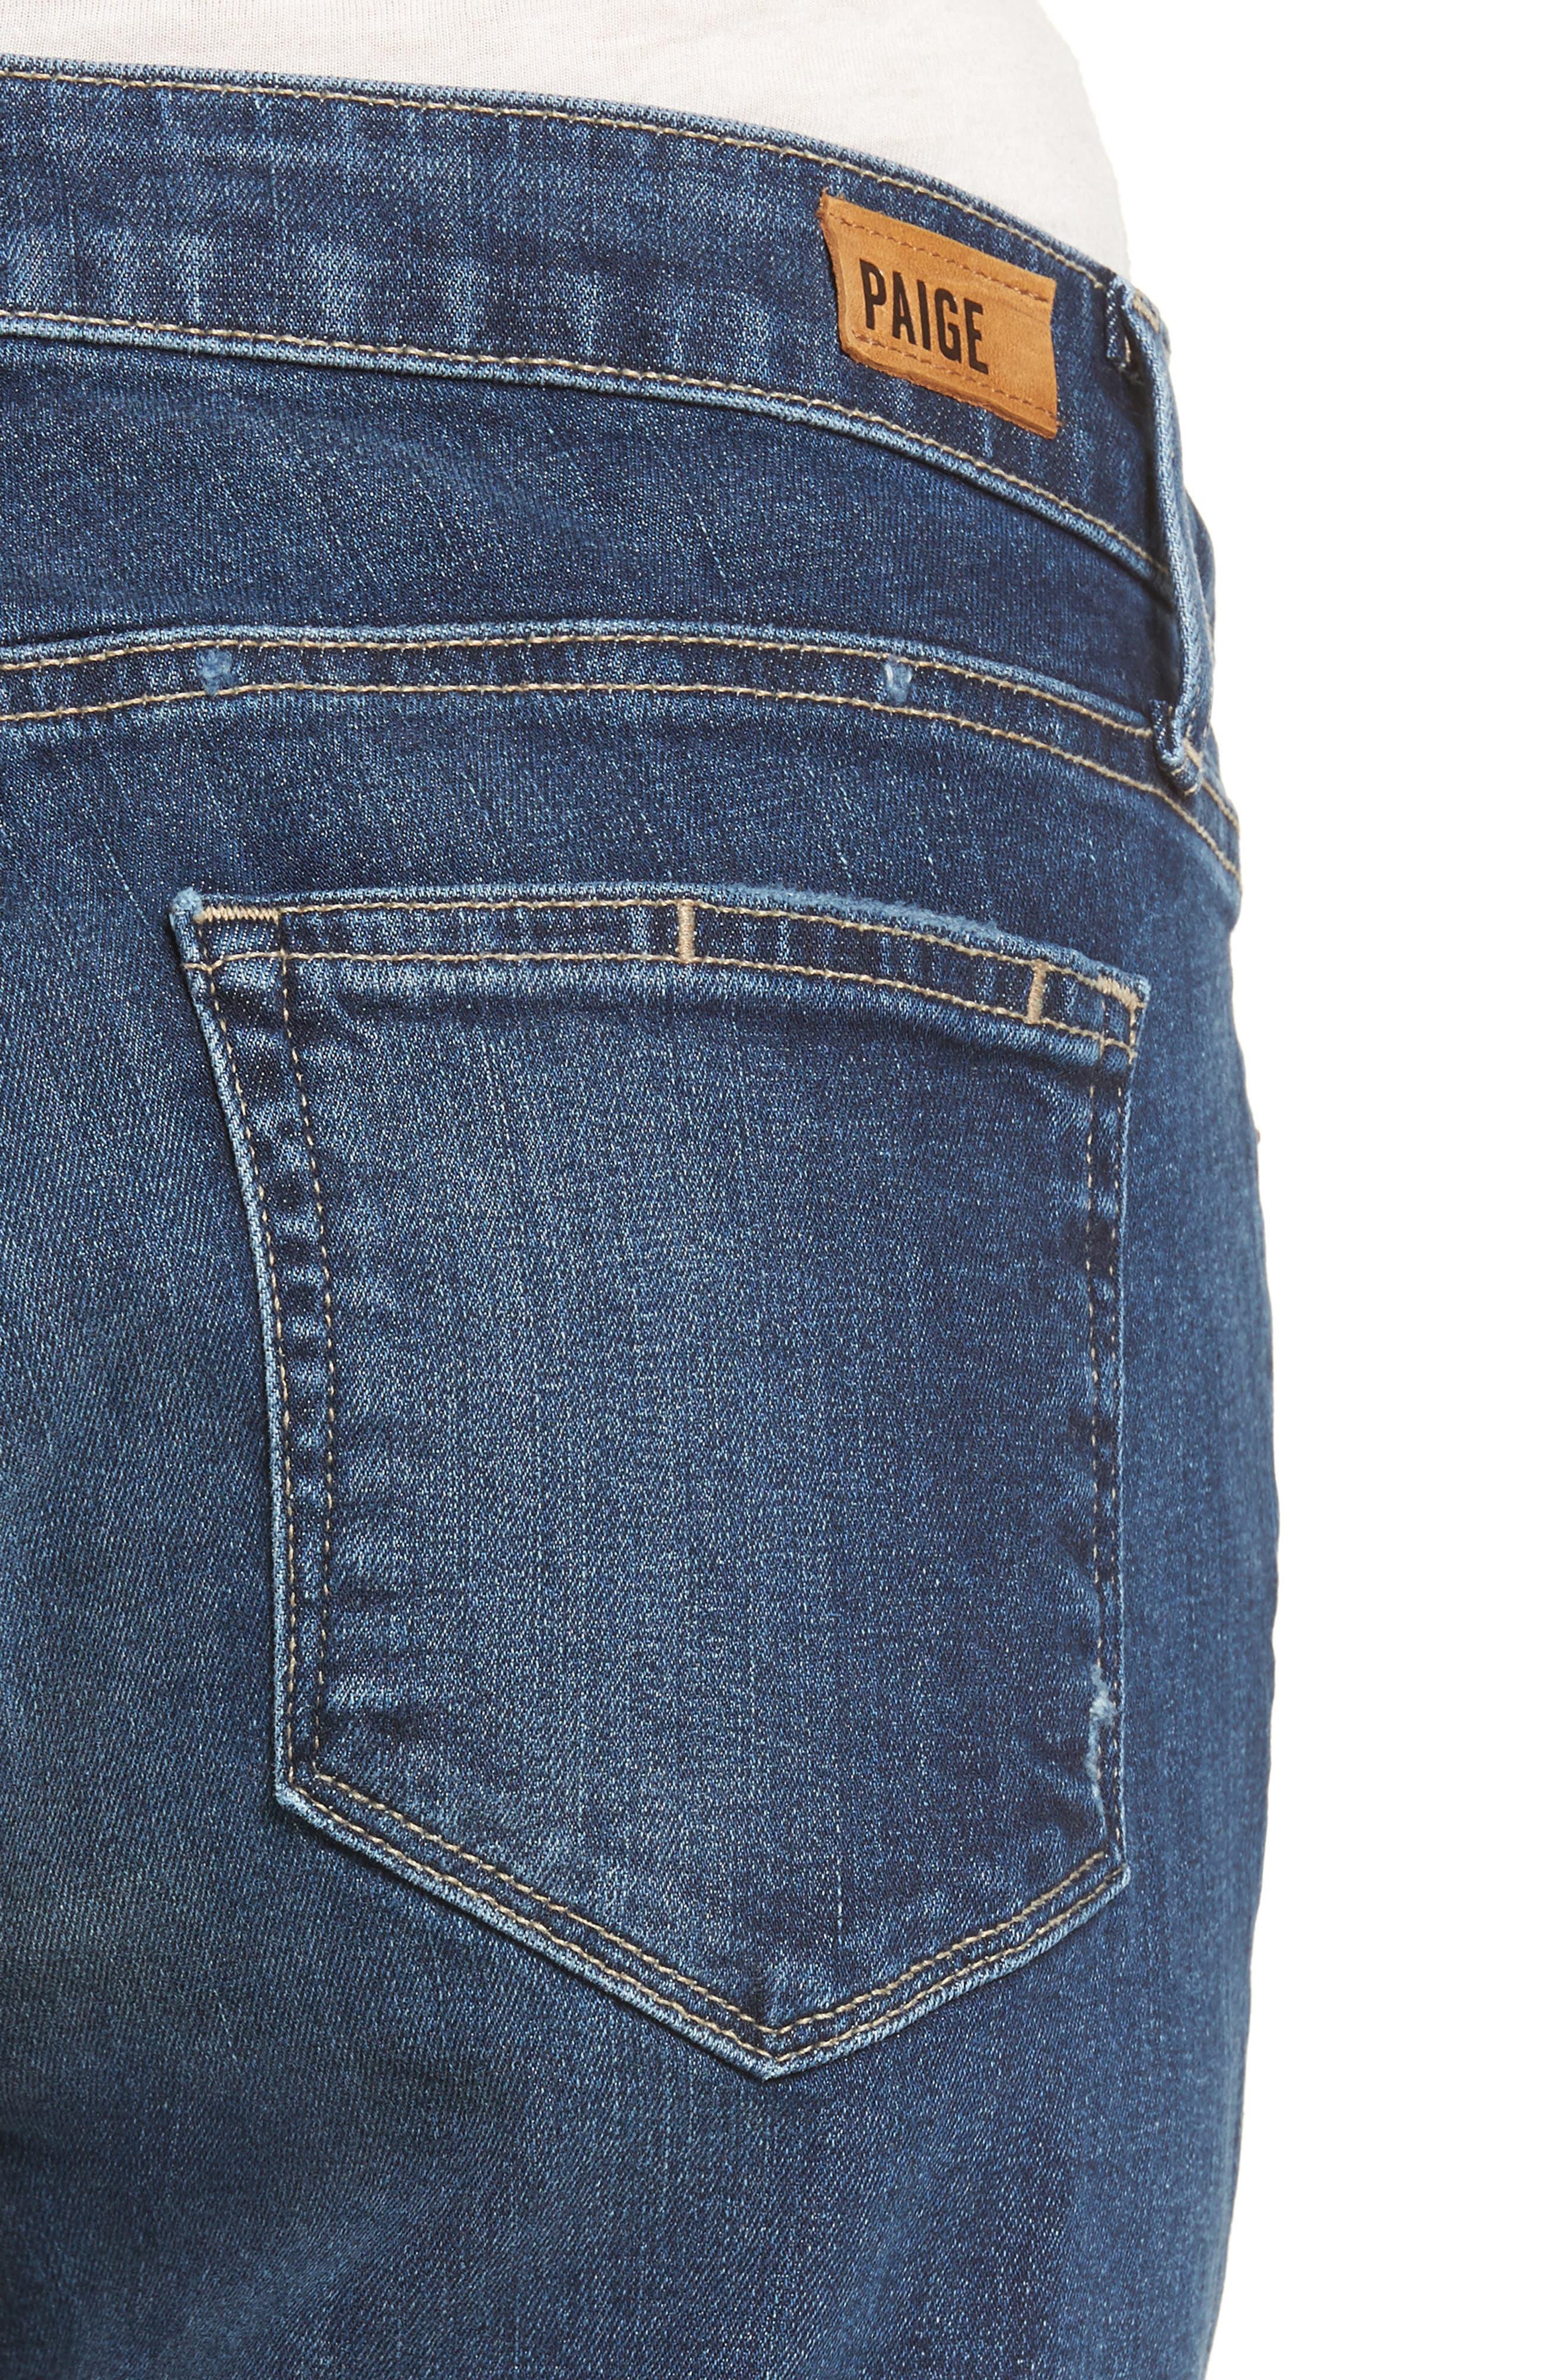 Jimmy Jimmy High Waist Crop Boyfriend Jeans,                             Alternate thumbnail 4, color,                             Blue